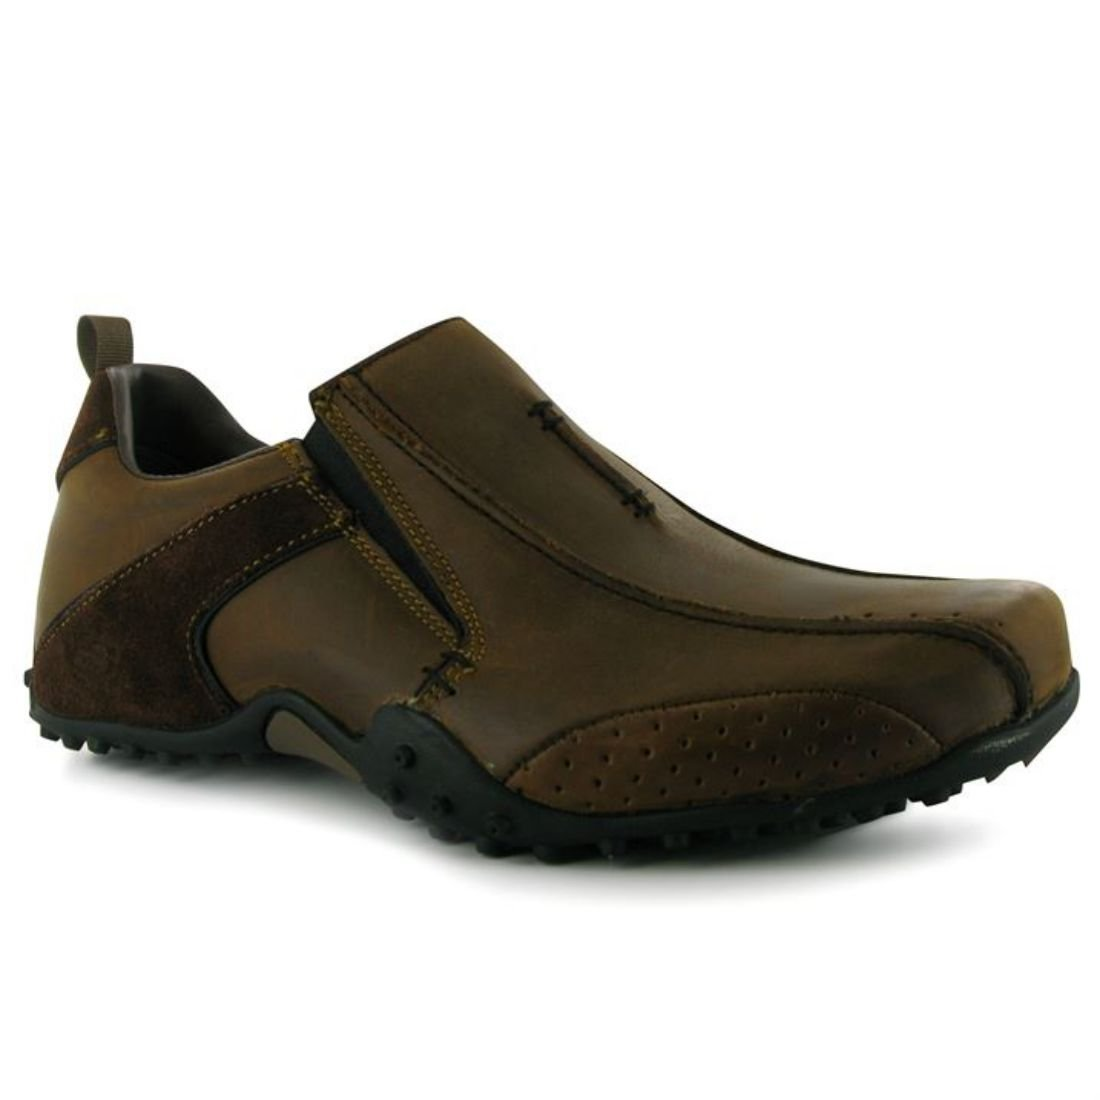 Skechers - Mocasines para hombre